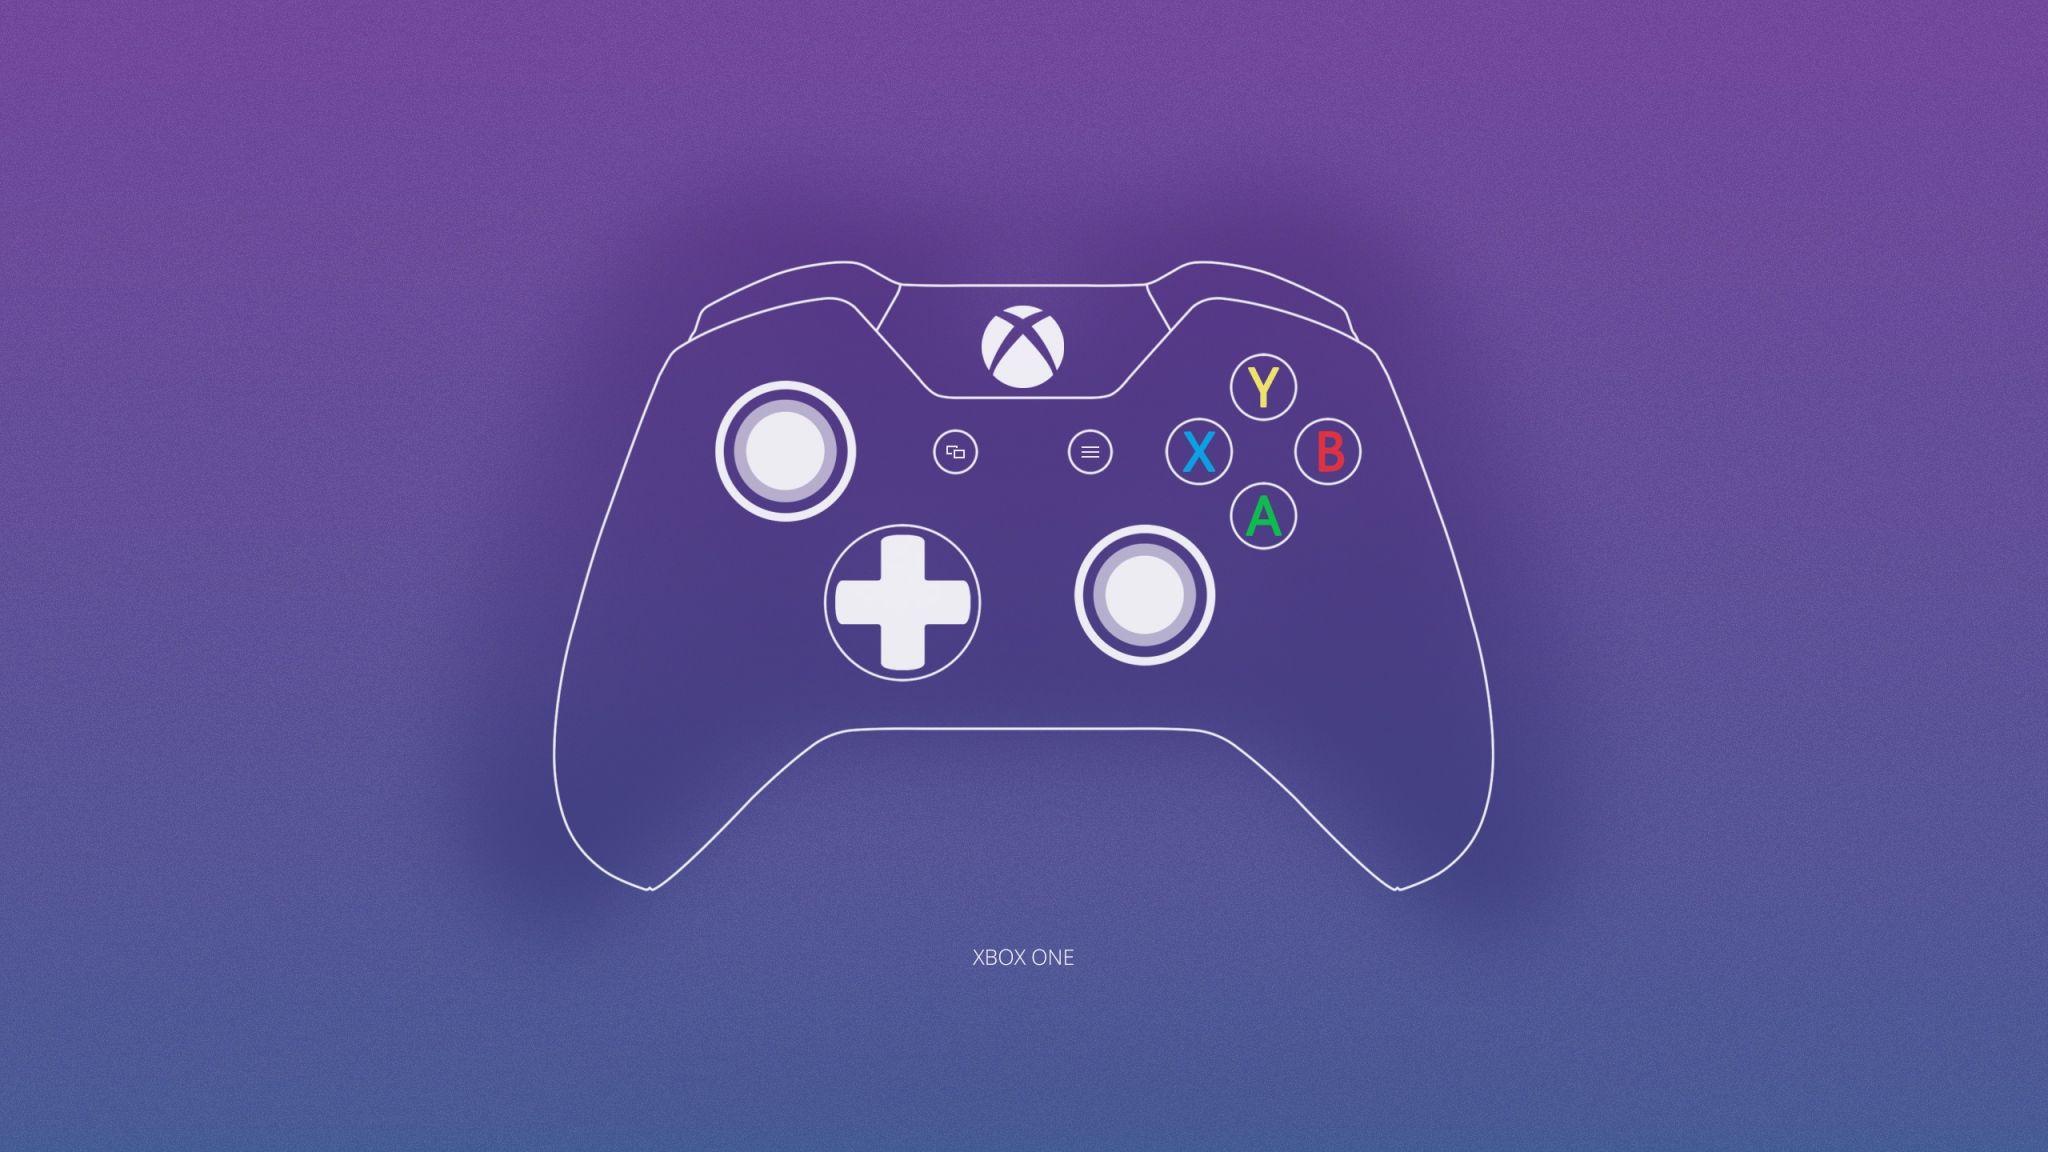 General 2048x1152 Xbox One Microsoft controllers joystick